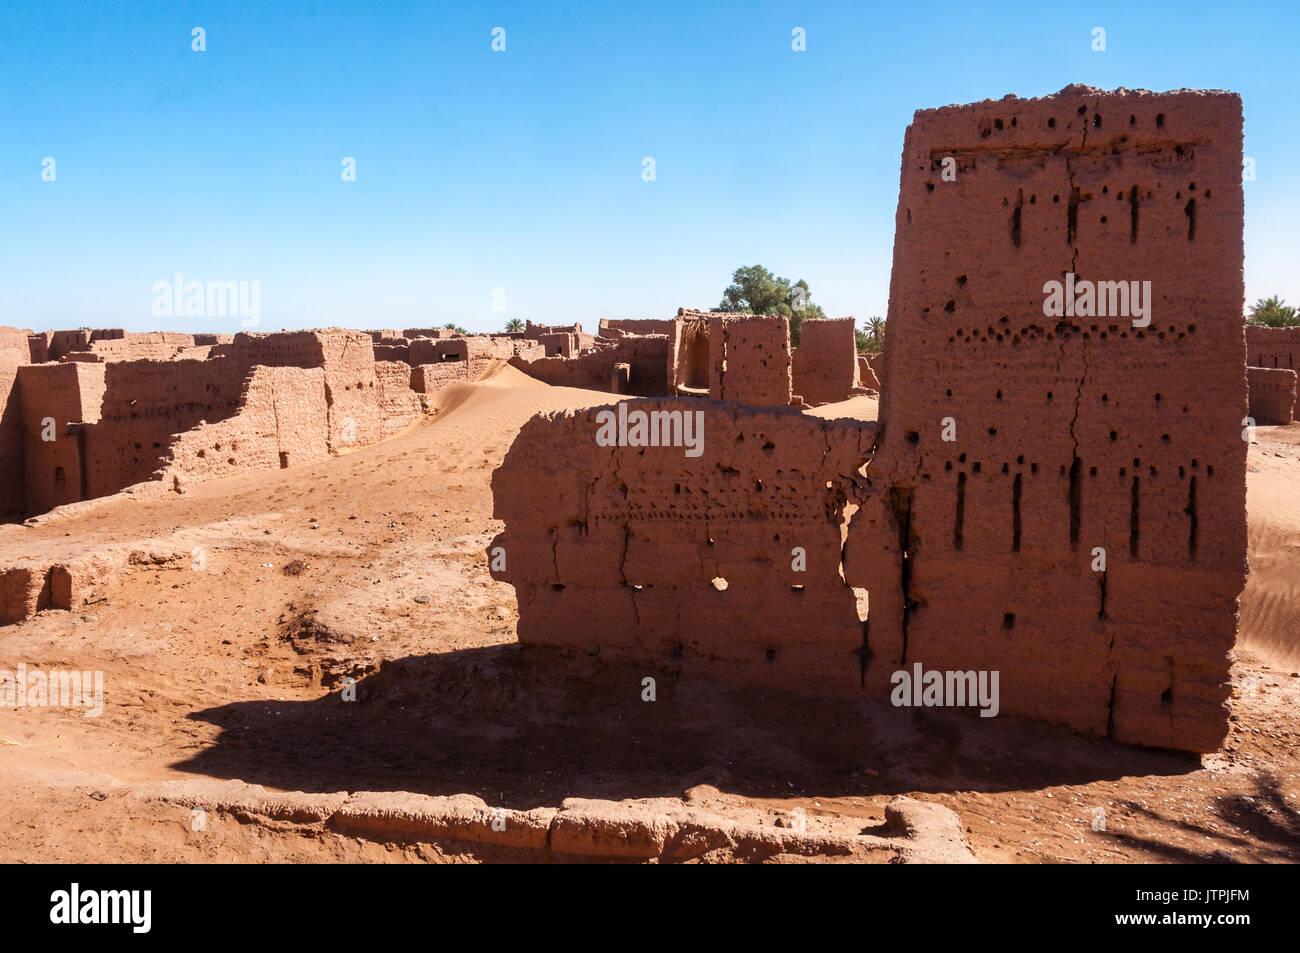 Abandoned Kasbah at sund dunes - Stock Image